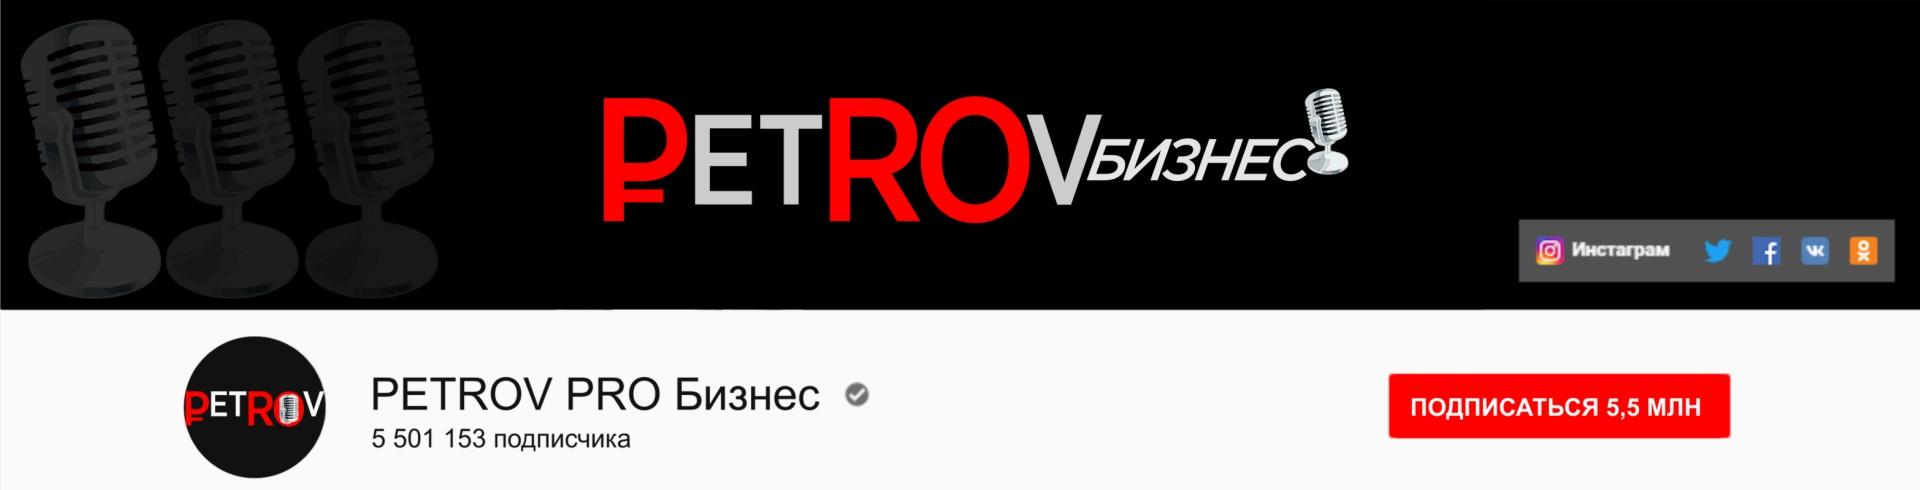 Создать логотип для YouTube канала  фото f_5765bfd744c4471e.jpg